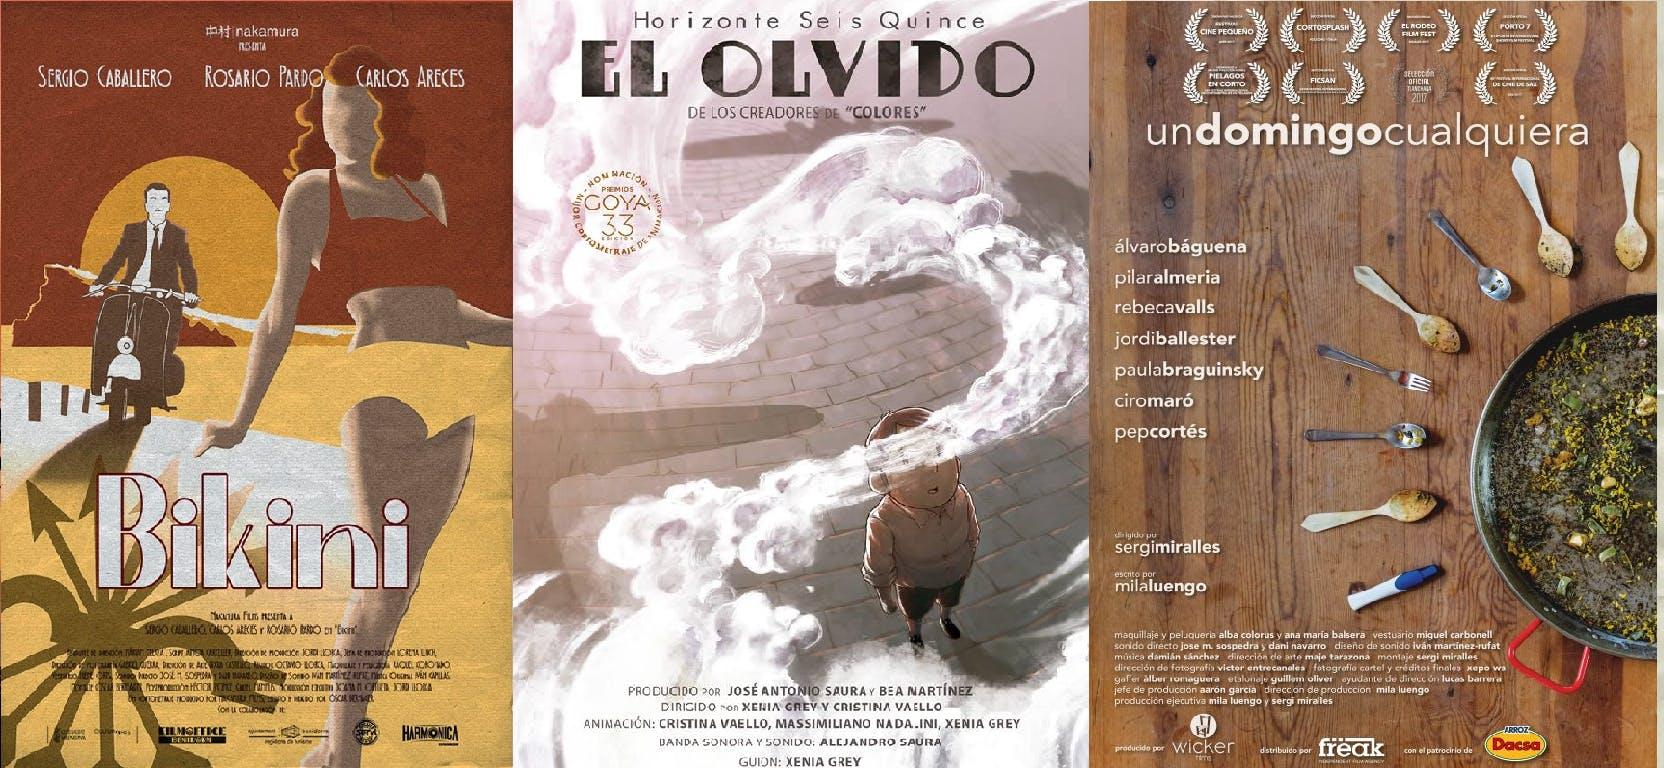 ACTIVIDAD EXTRAESCOLAR INSTITUTOS SAN VICENTE